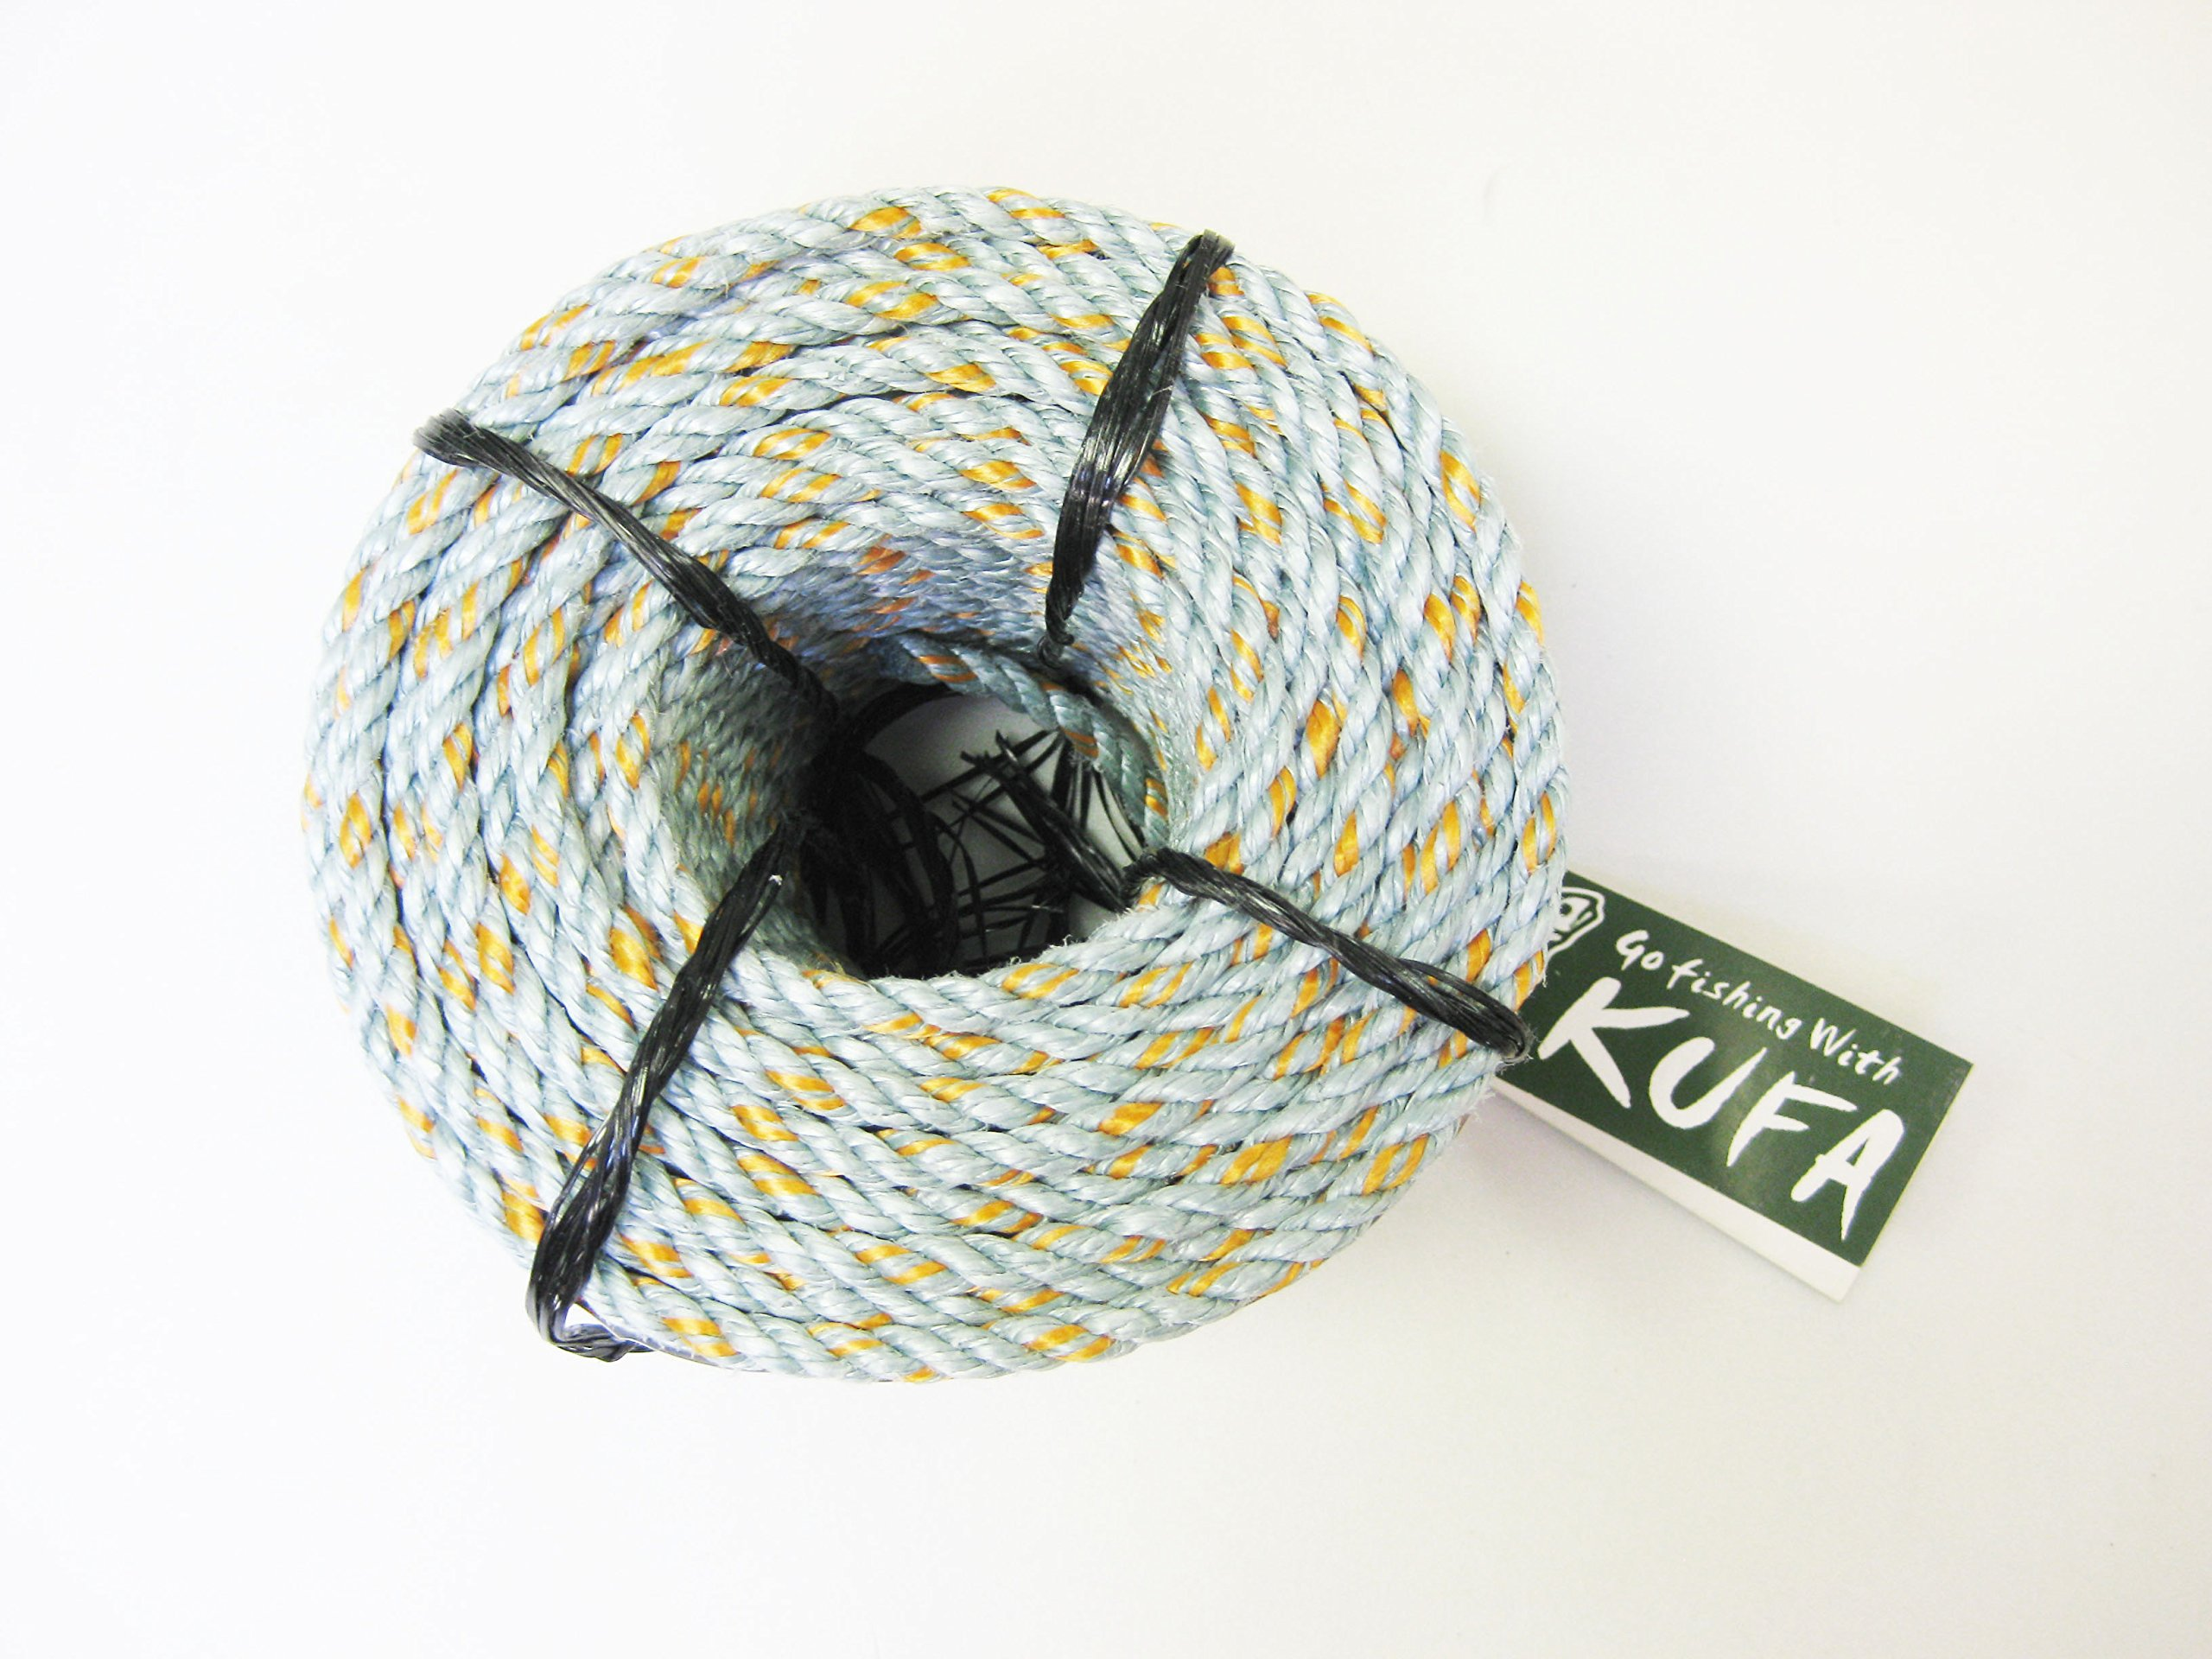 KUFA Sports 1/4'' Lead Core Line, 100-feet length lead core sinking rope for Crab Trap LQ1